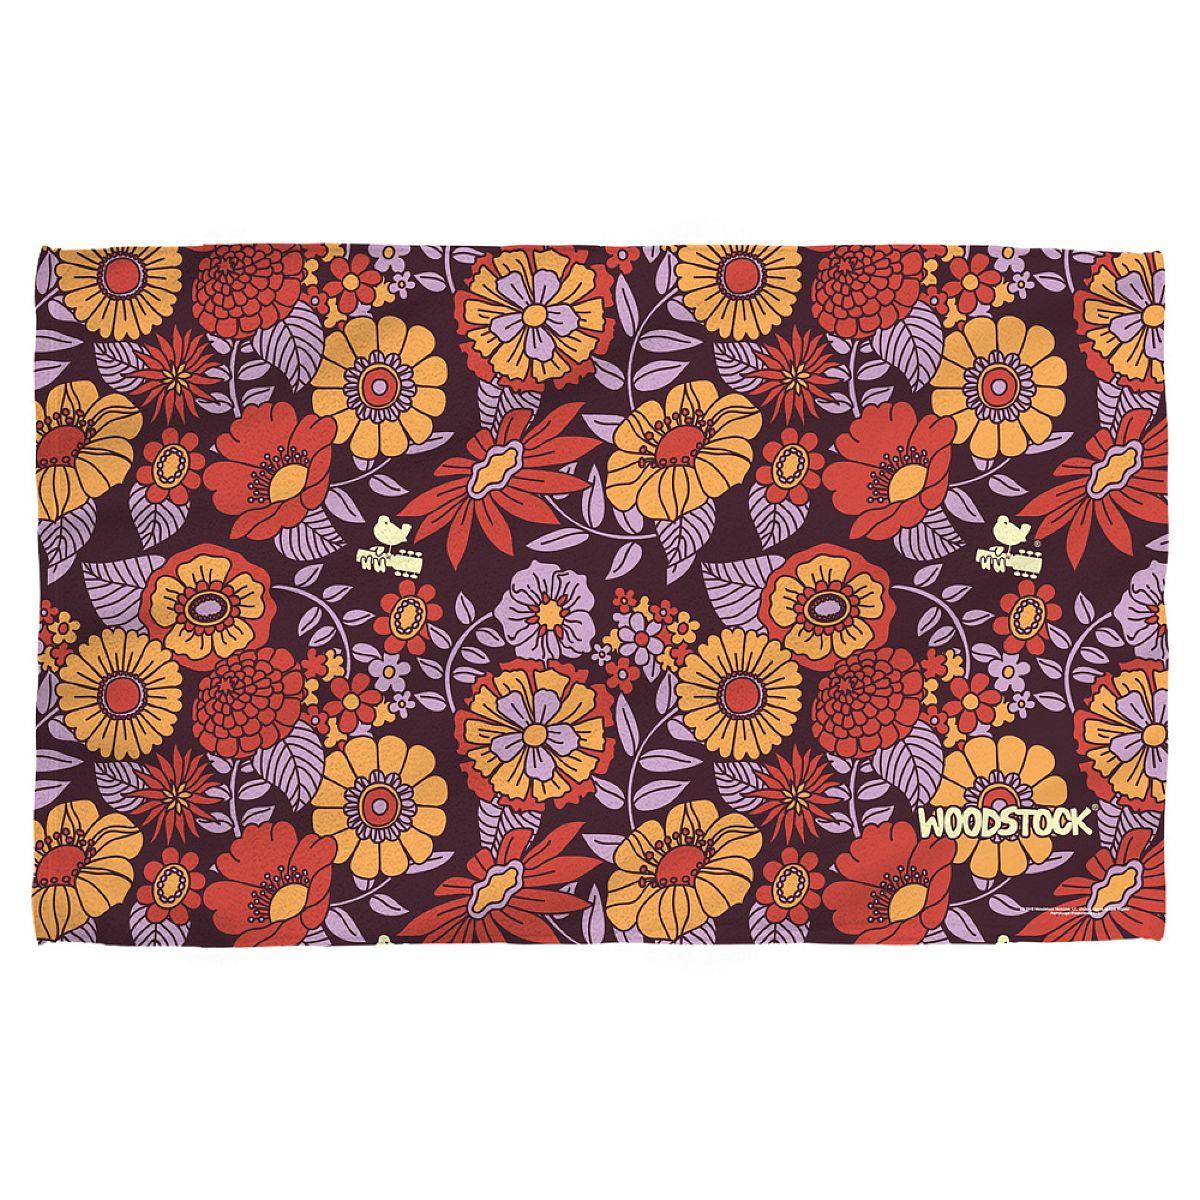 Woodstock Flower Set Bath Towel